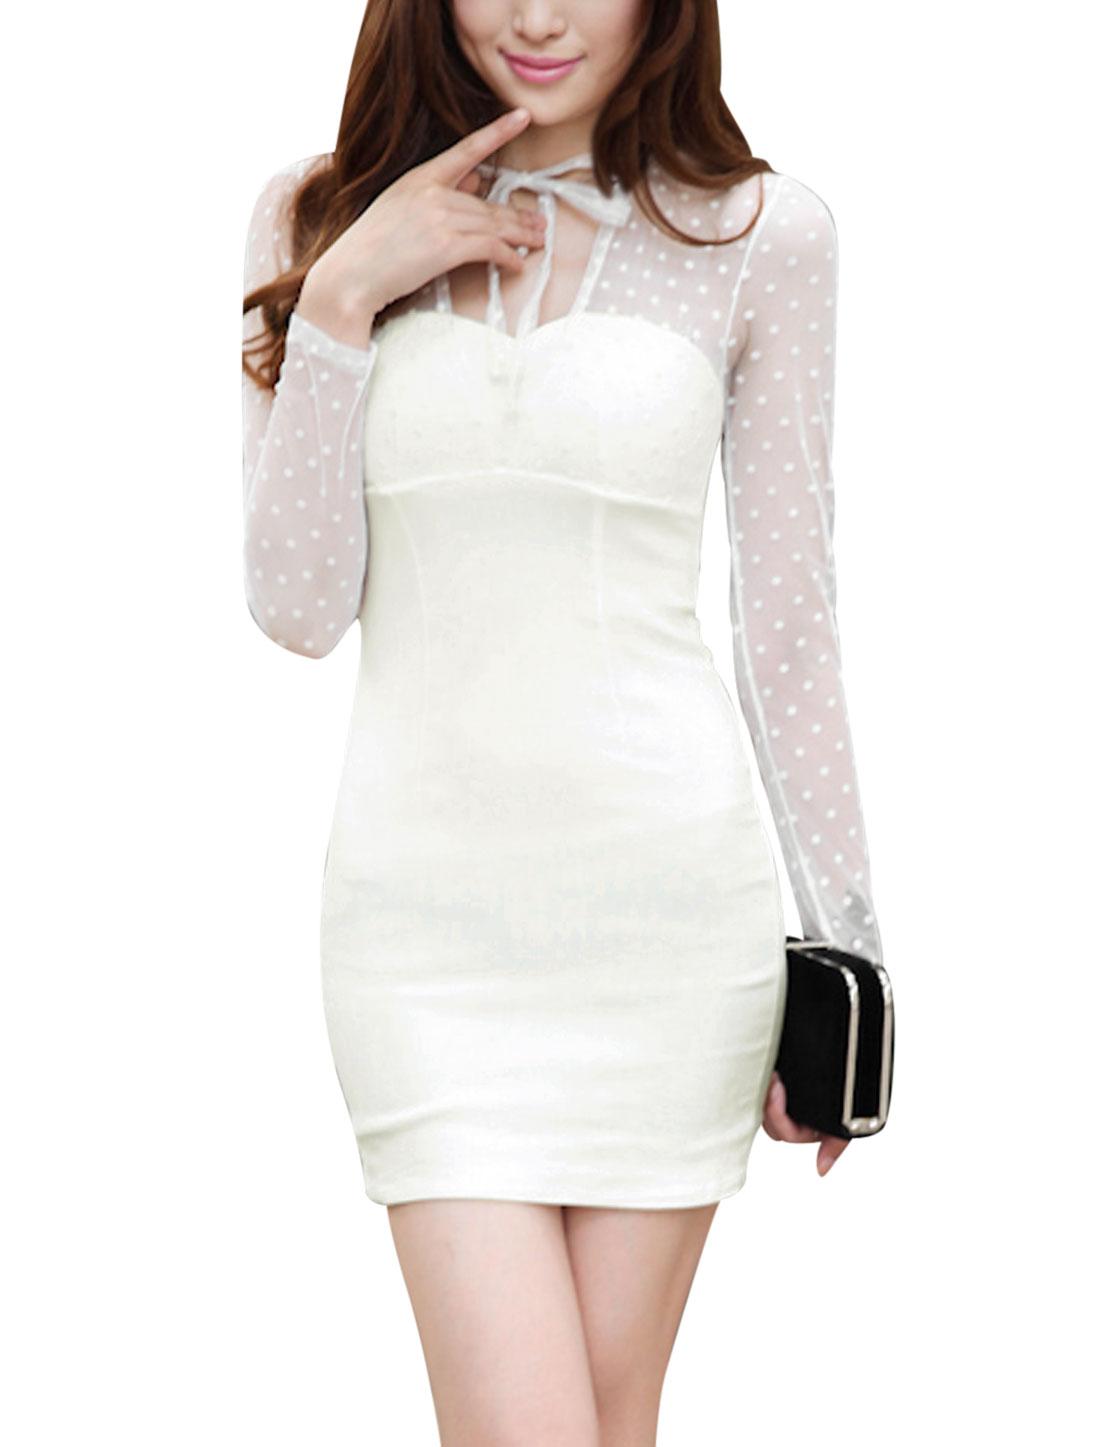 Ladies Cut Out Back Mesh Panel White Sheath Dress XS